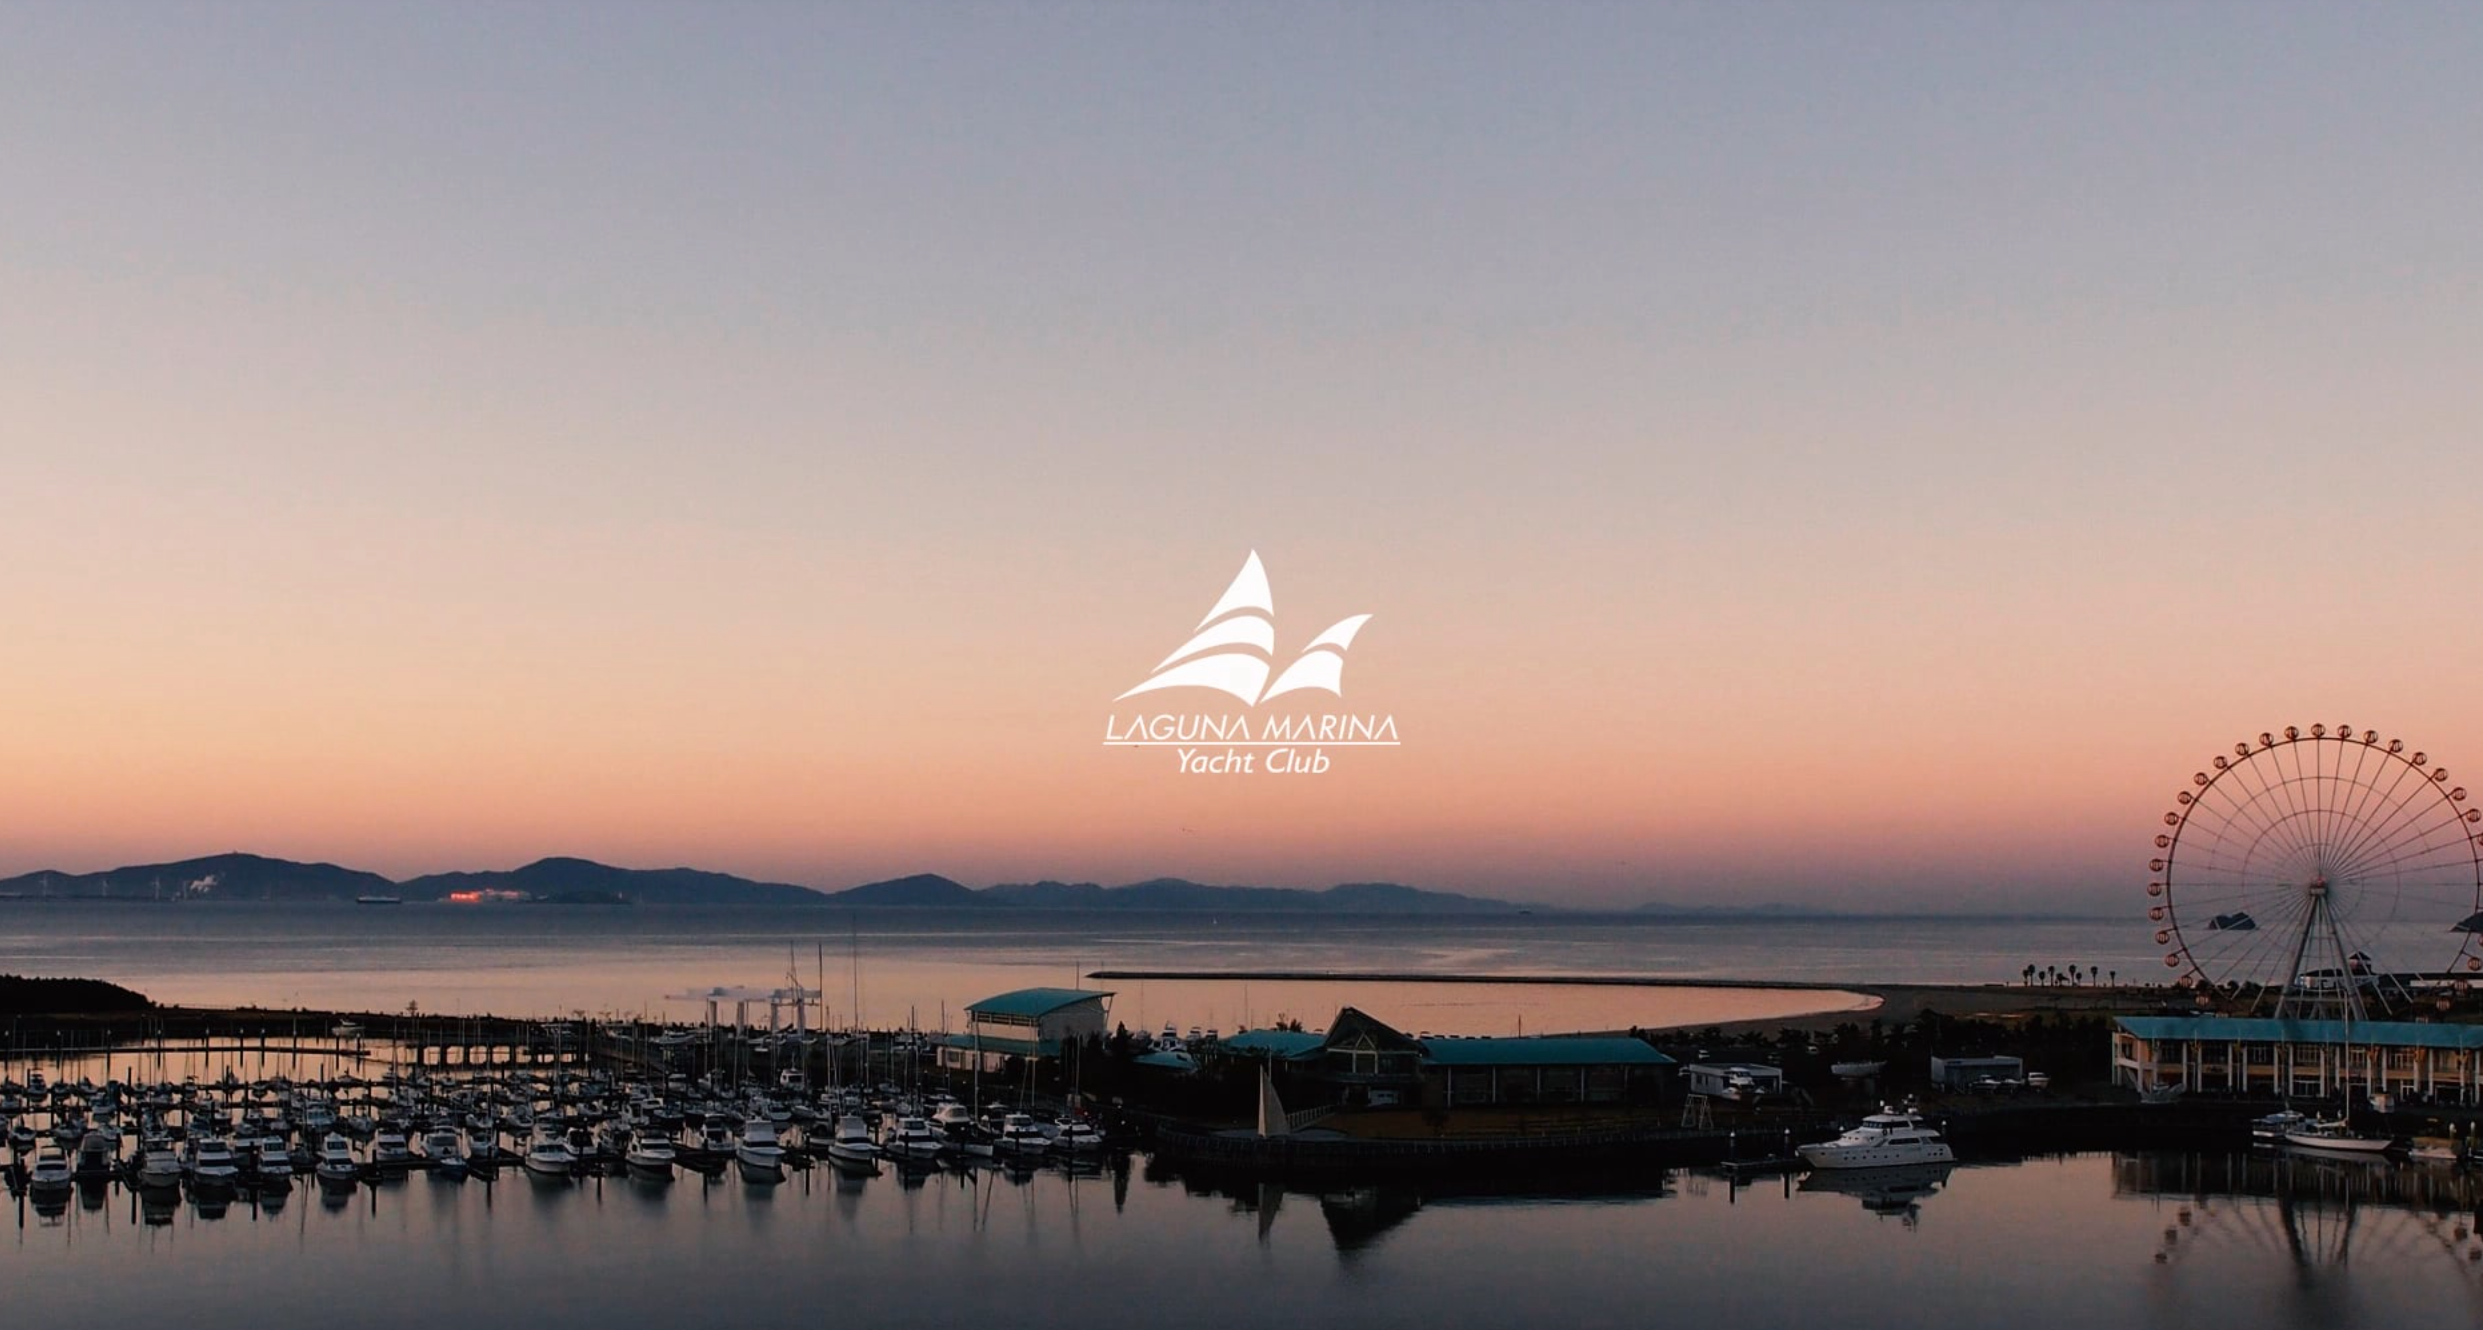 Laguna Marina Yacht Club